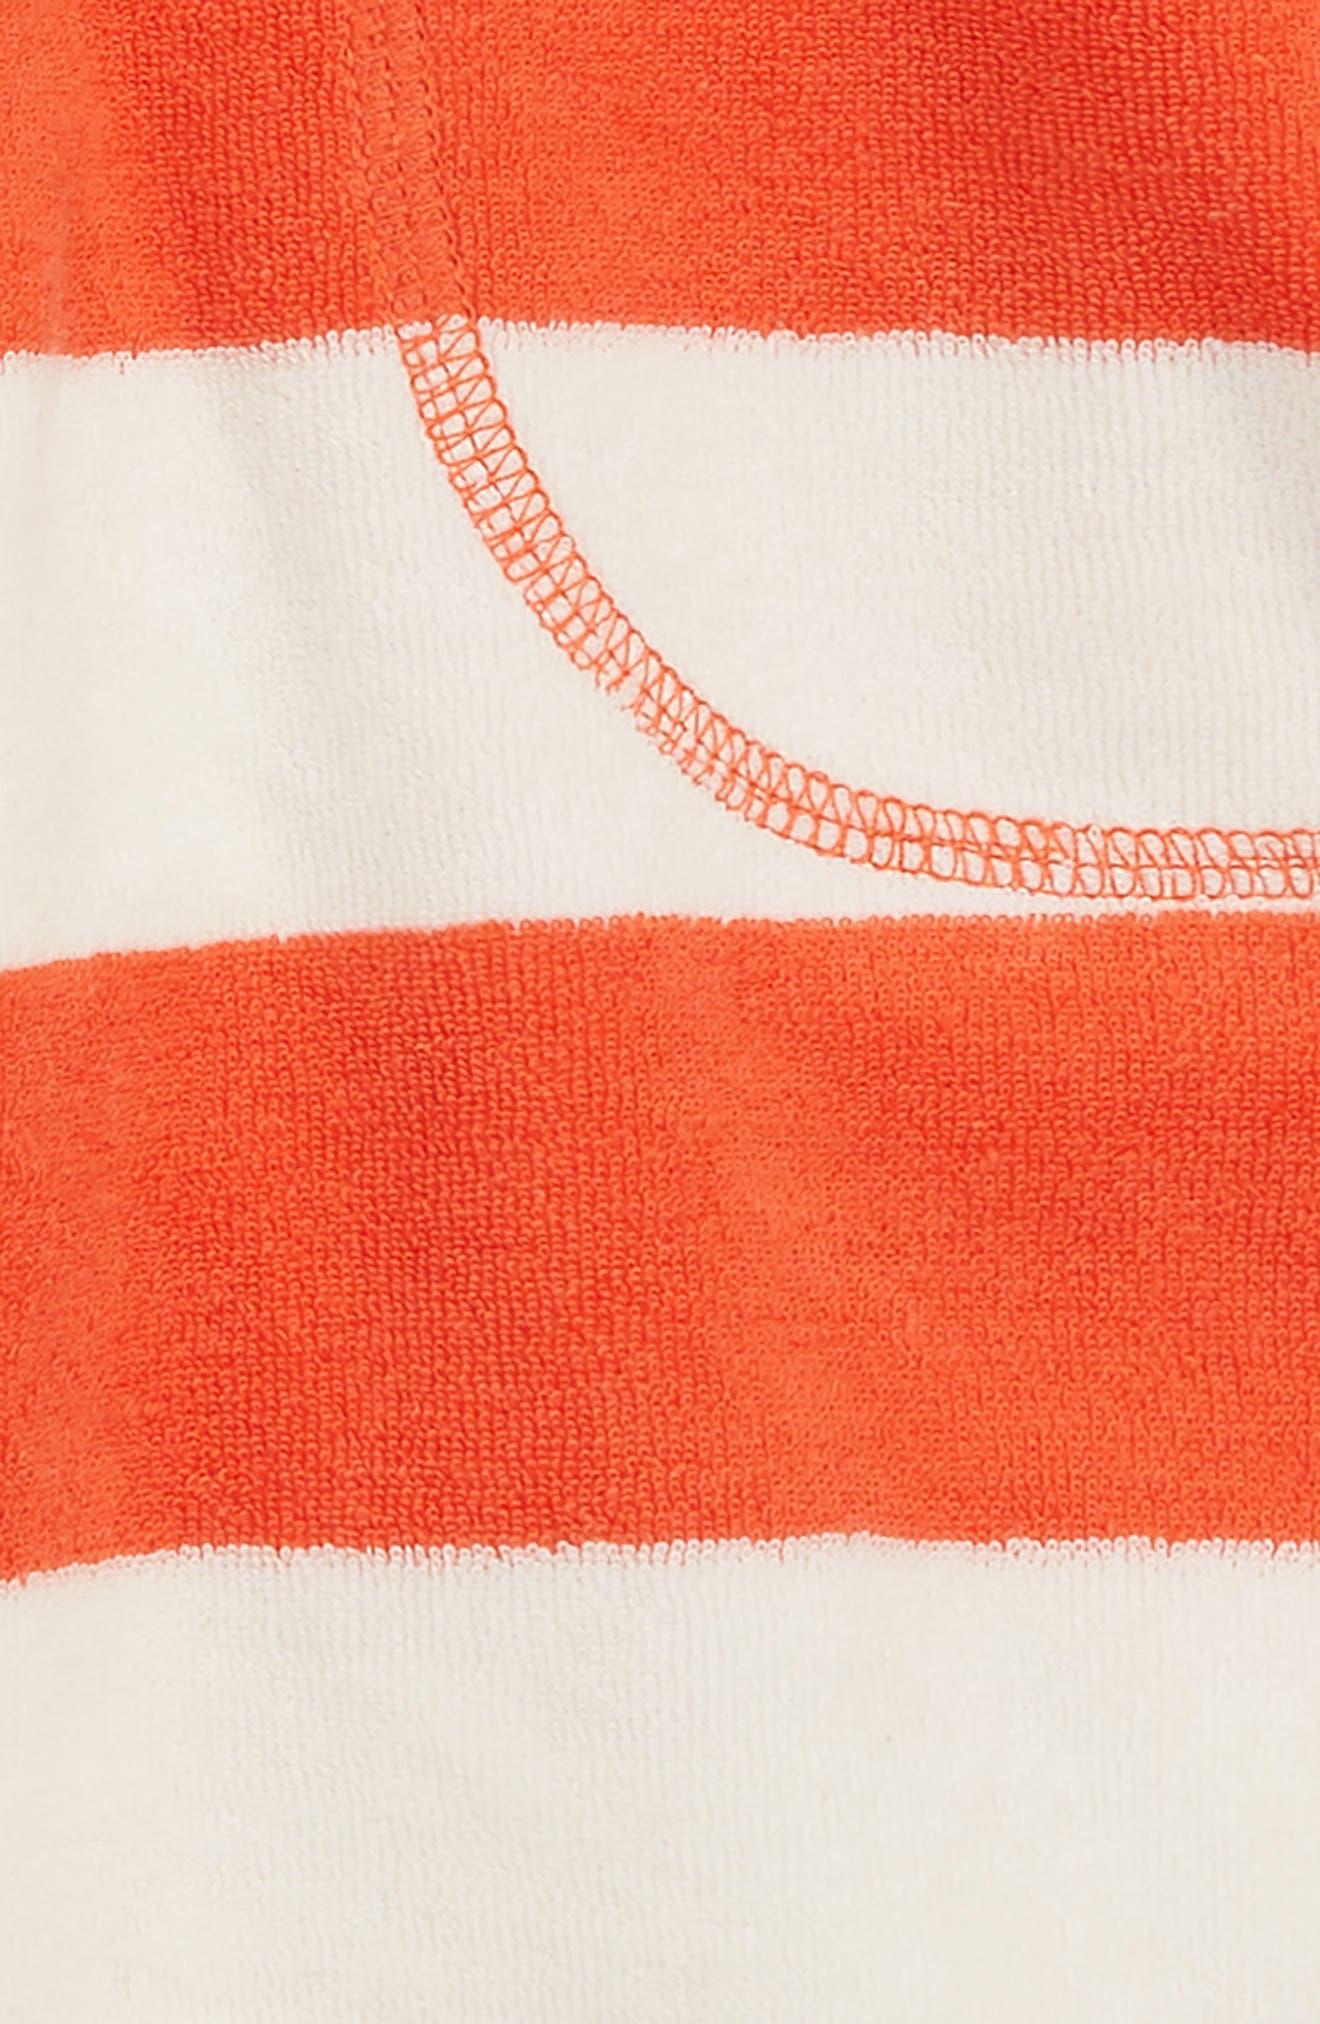 Stripe Toweling Shorts,                             Alternate thumbnail 2, color,                             Melon Crush Red/ Ecru